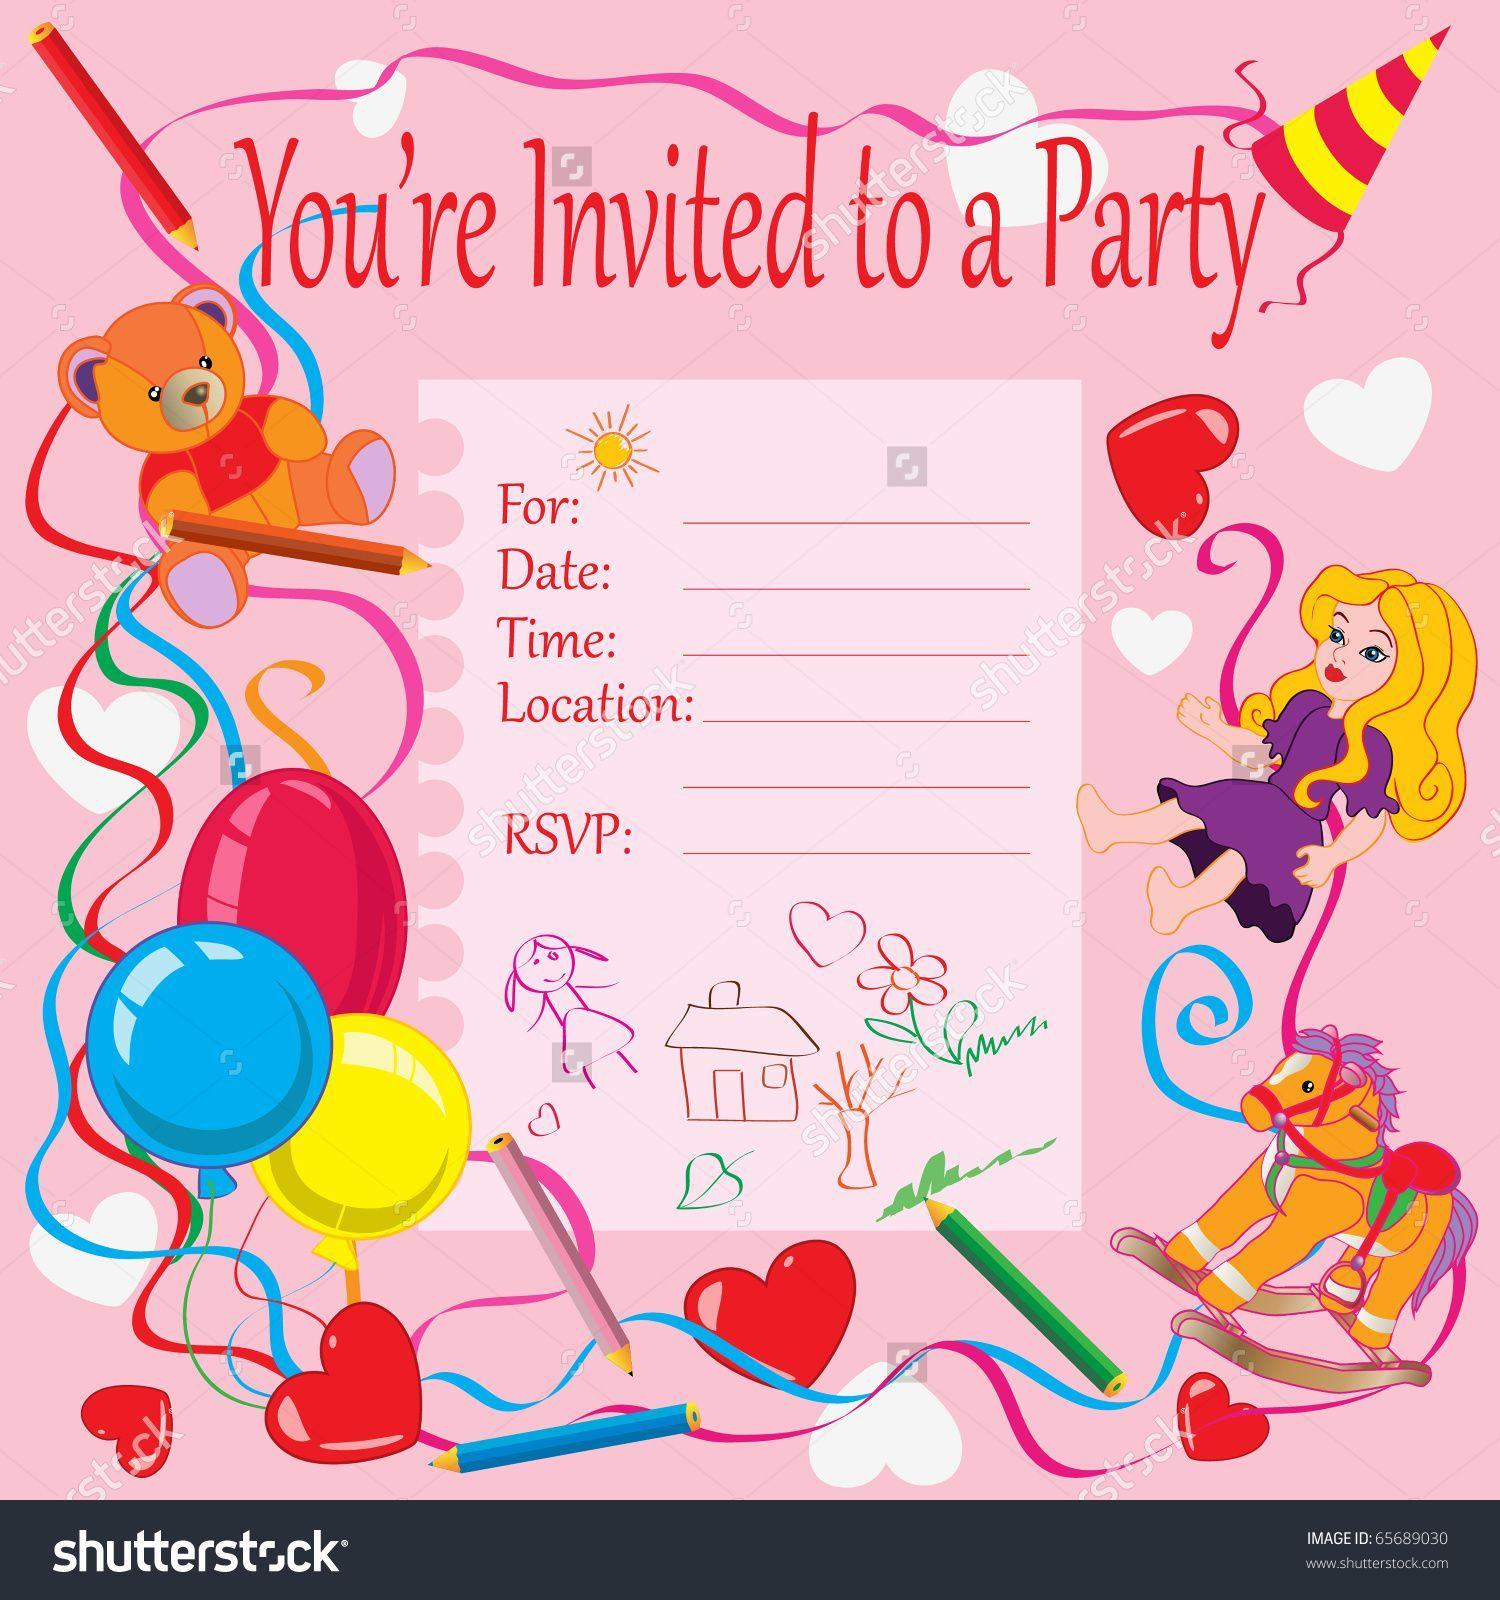 Birthday Party Invitations For Kids+free Templates | undangan ...